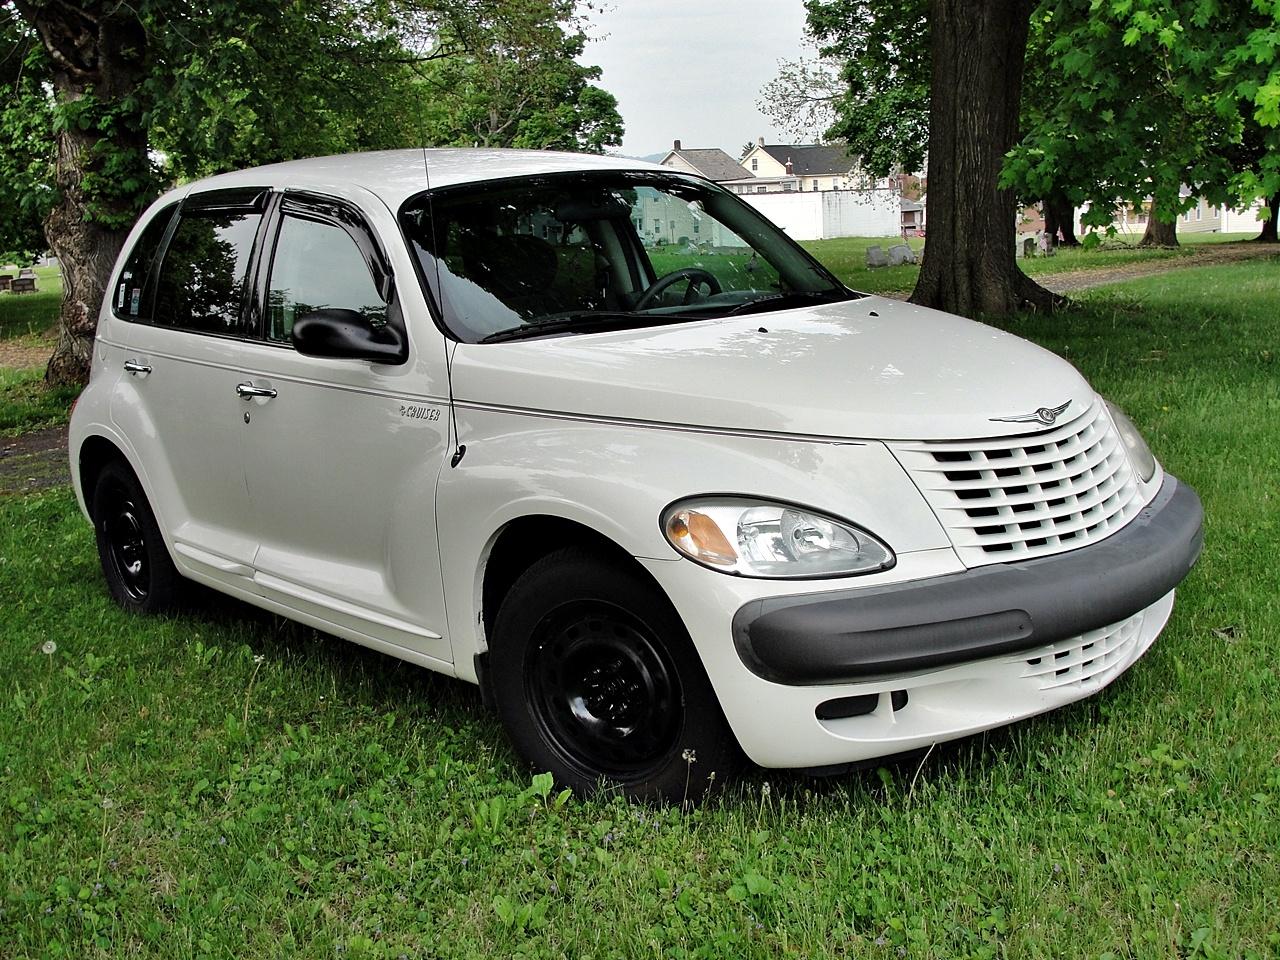 2002 Chrysler PT Cruiser Pictures C1560